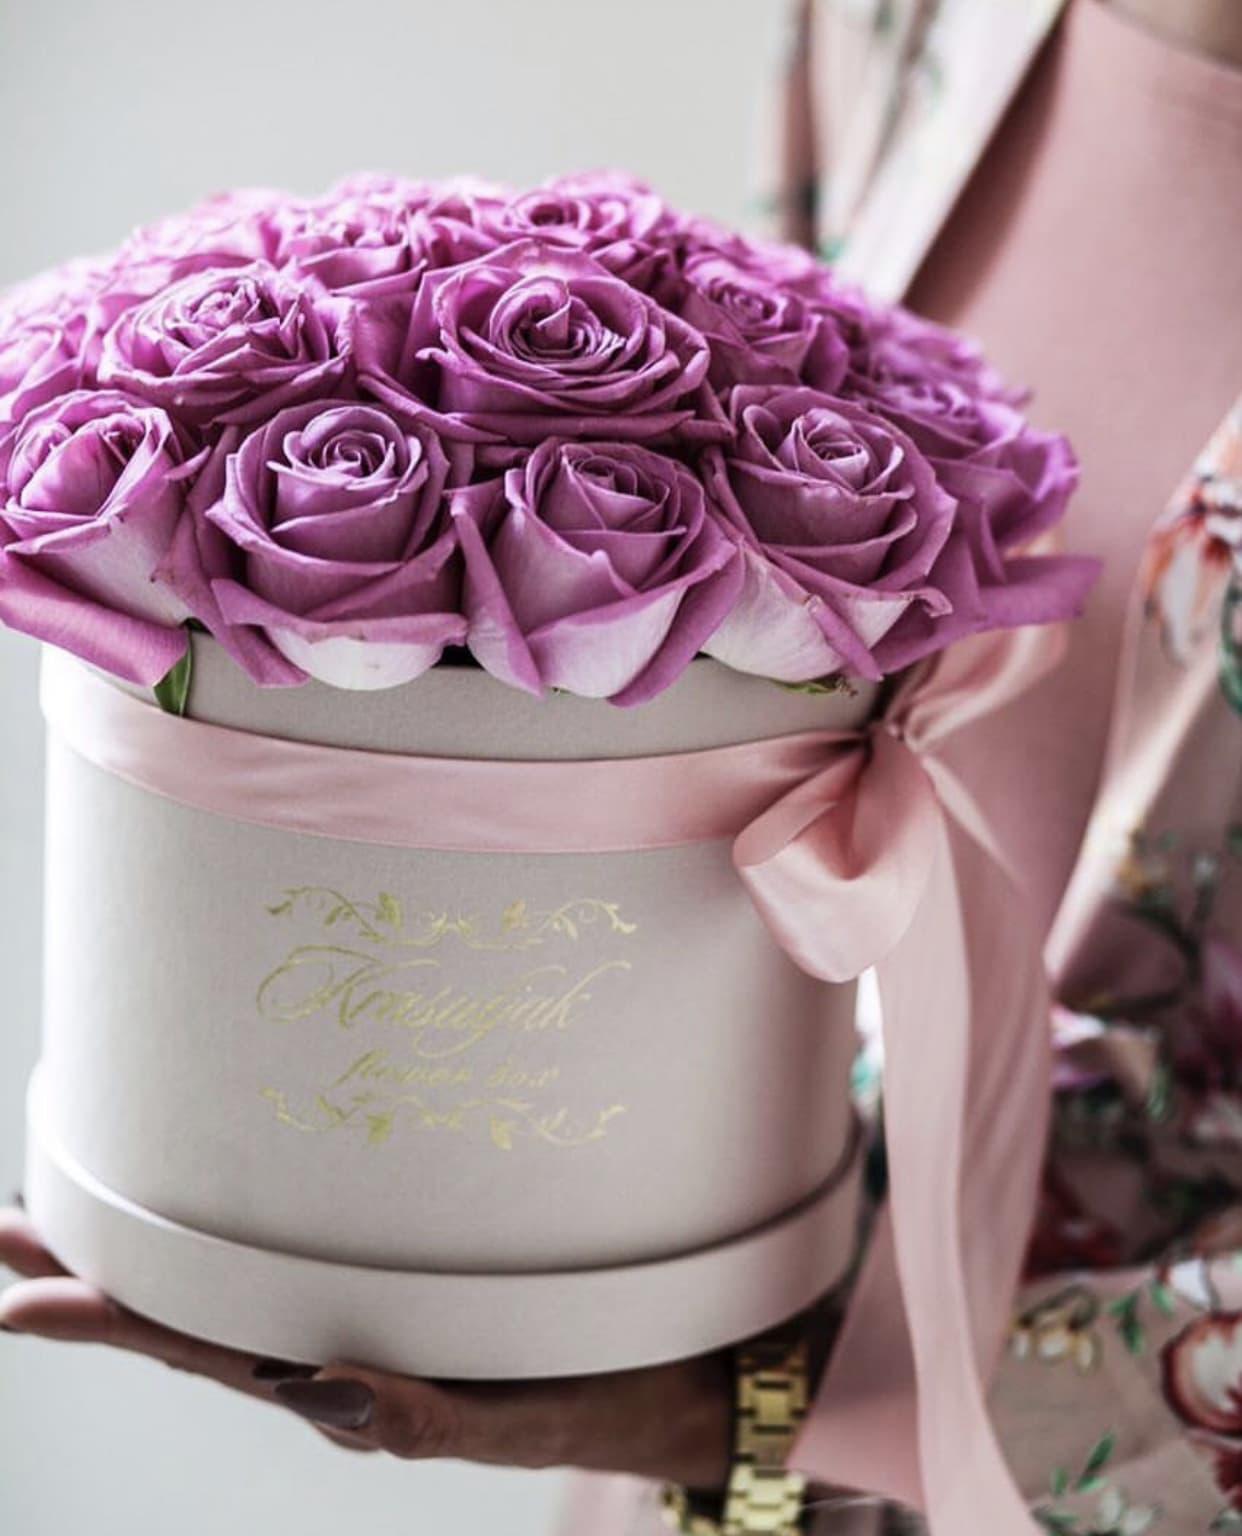 Siva kutija sa rozim ruzama